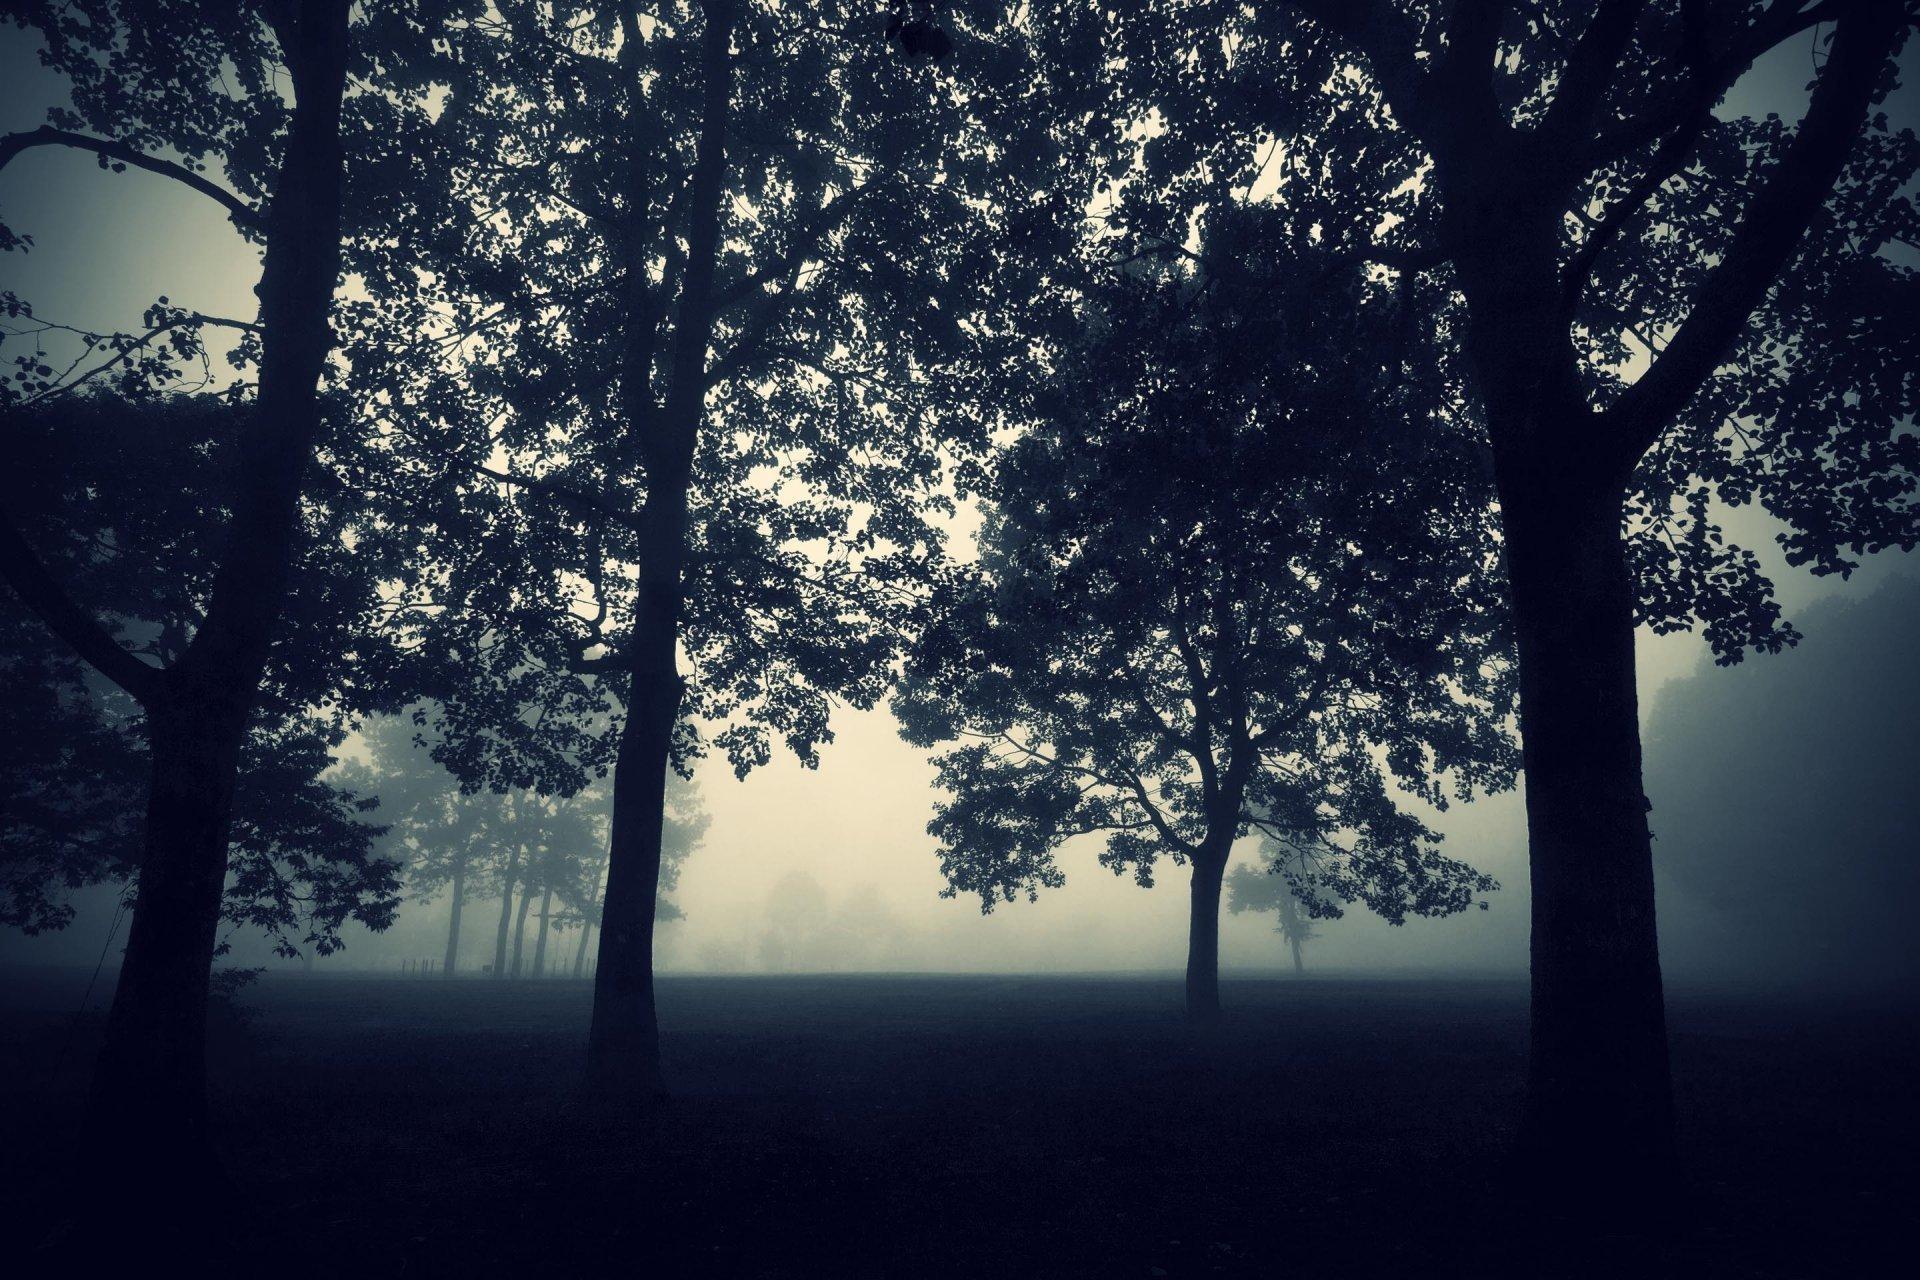 Free Download Tree Fog Darkness Night Twilight Nature Mysticism